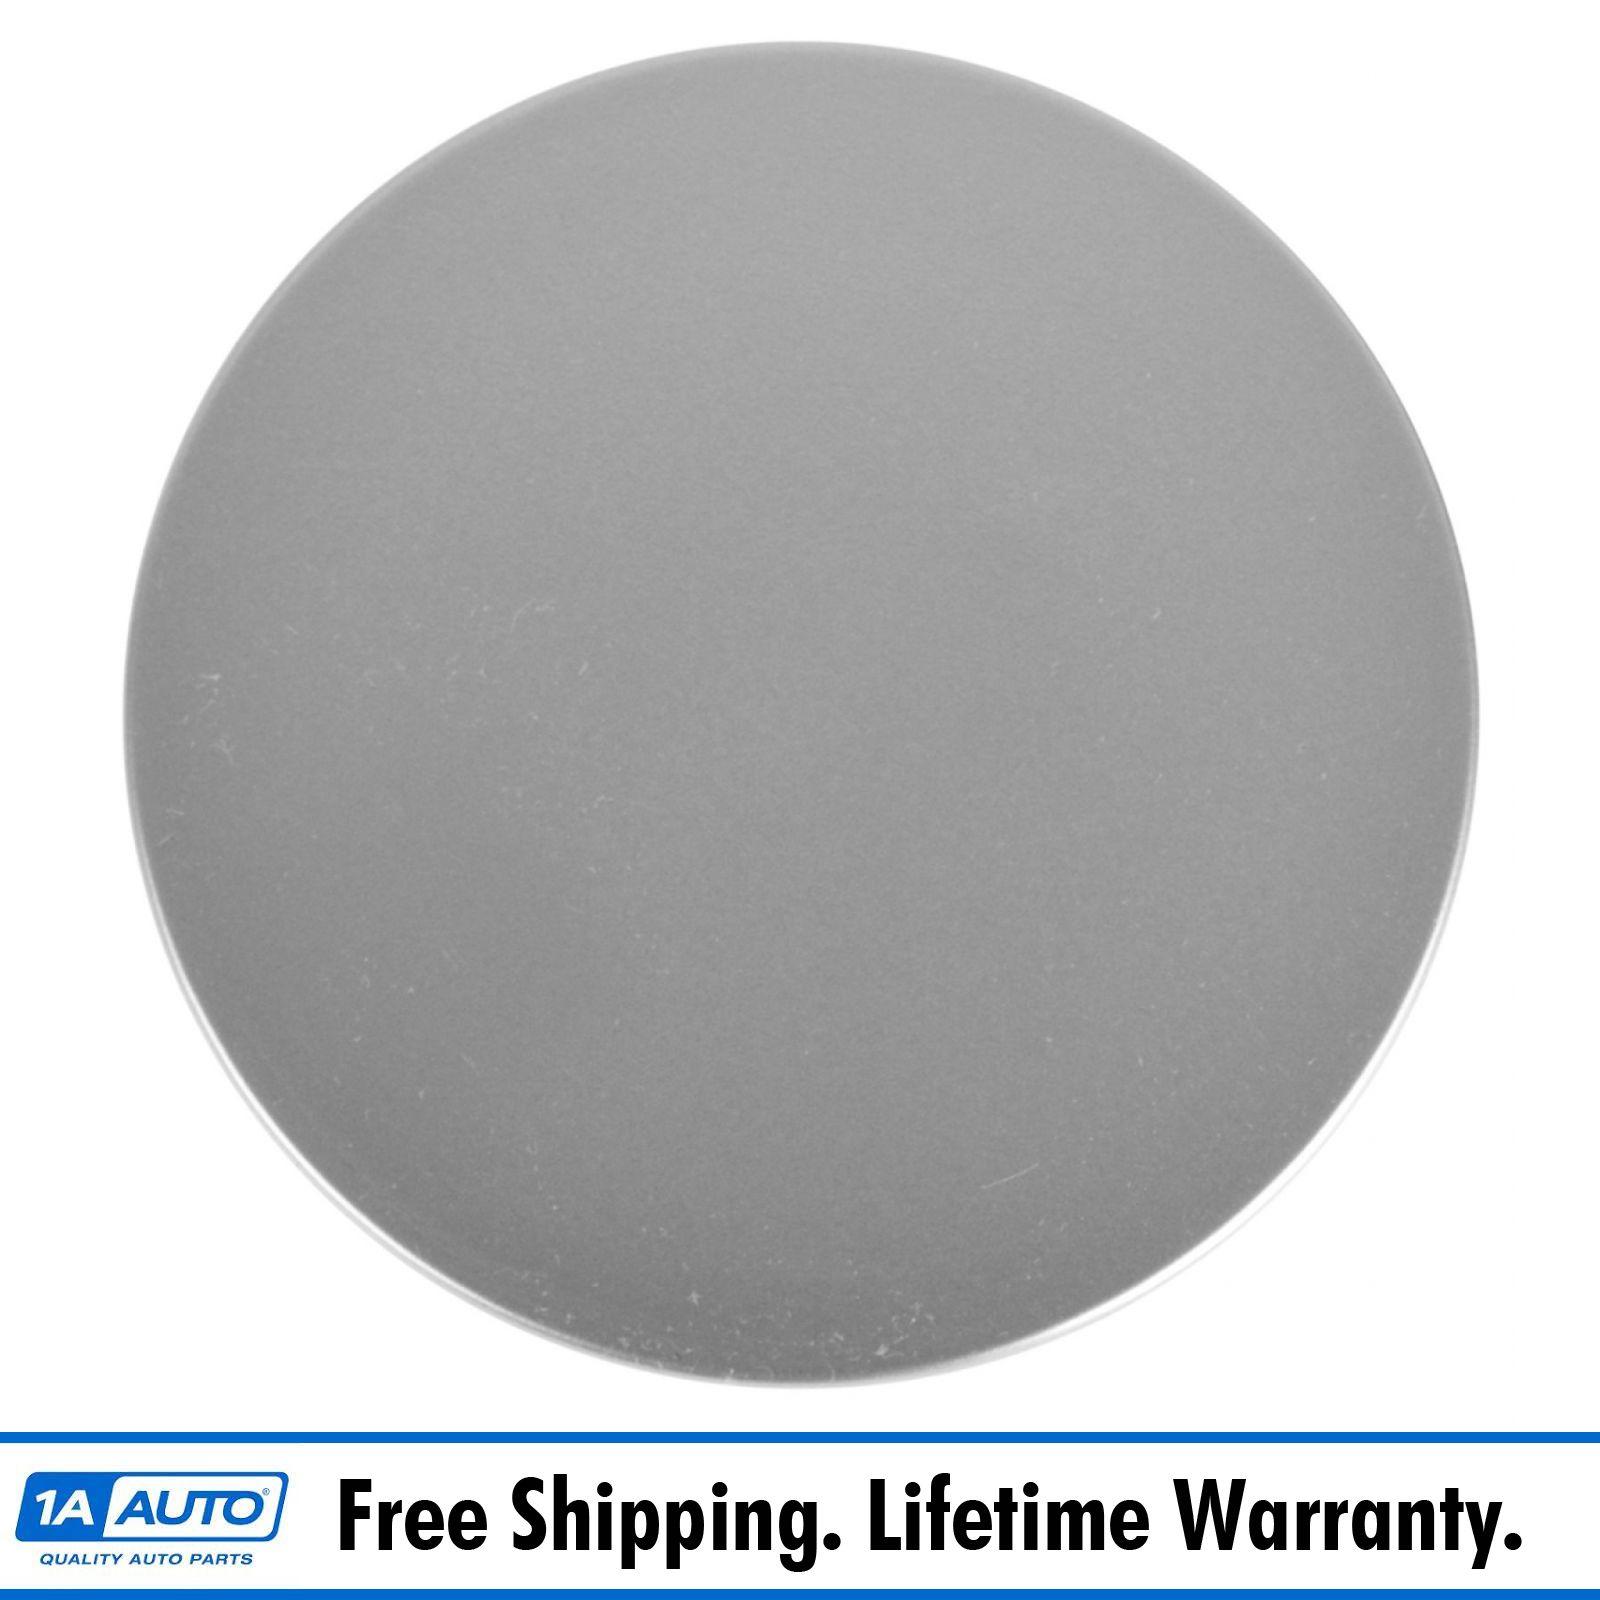 Dorman 909-100 Silver Painted Wheel Center Cap